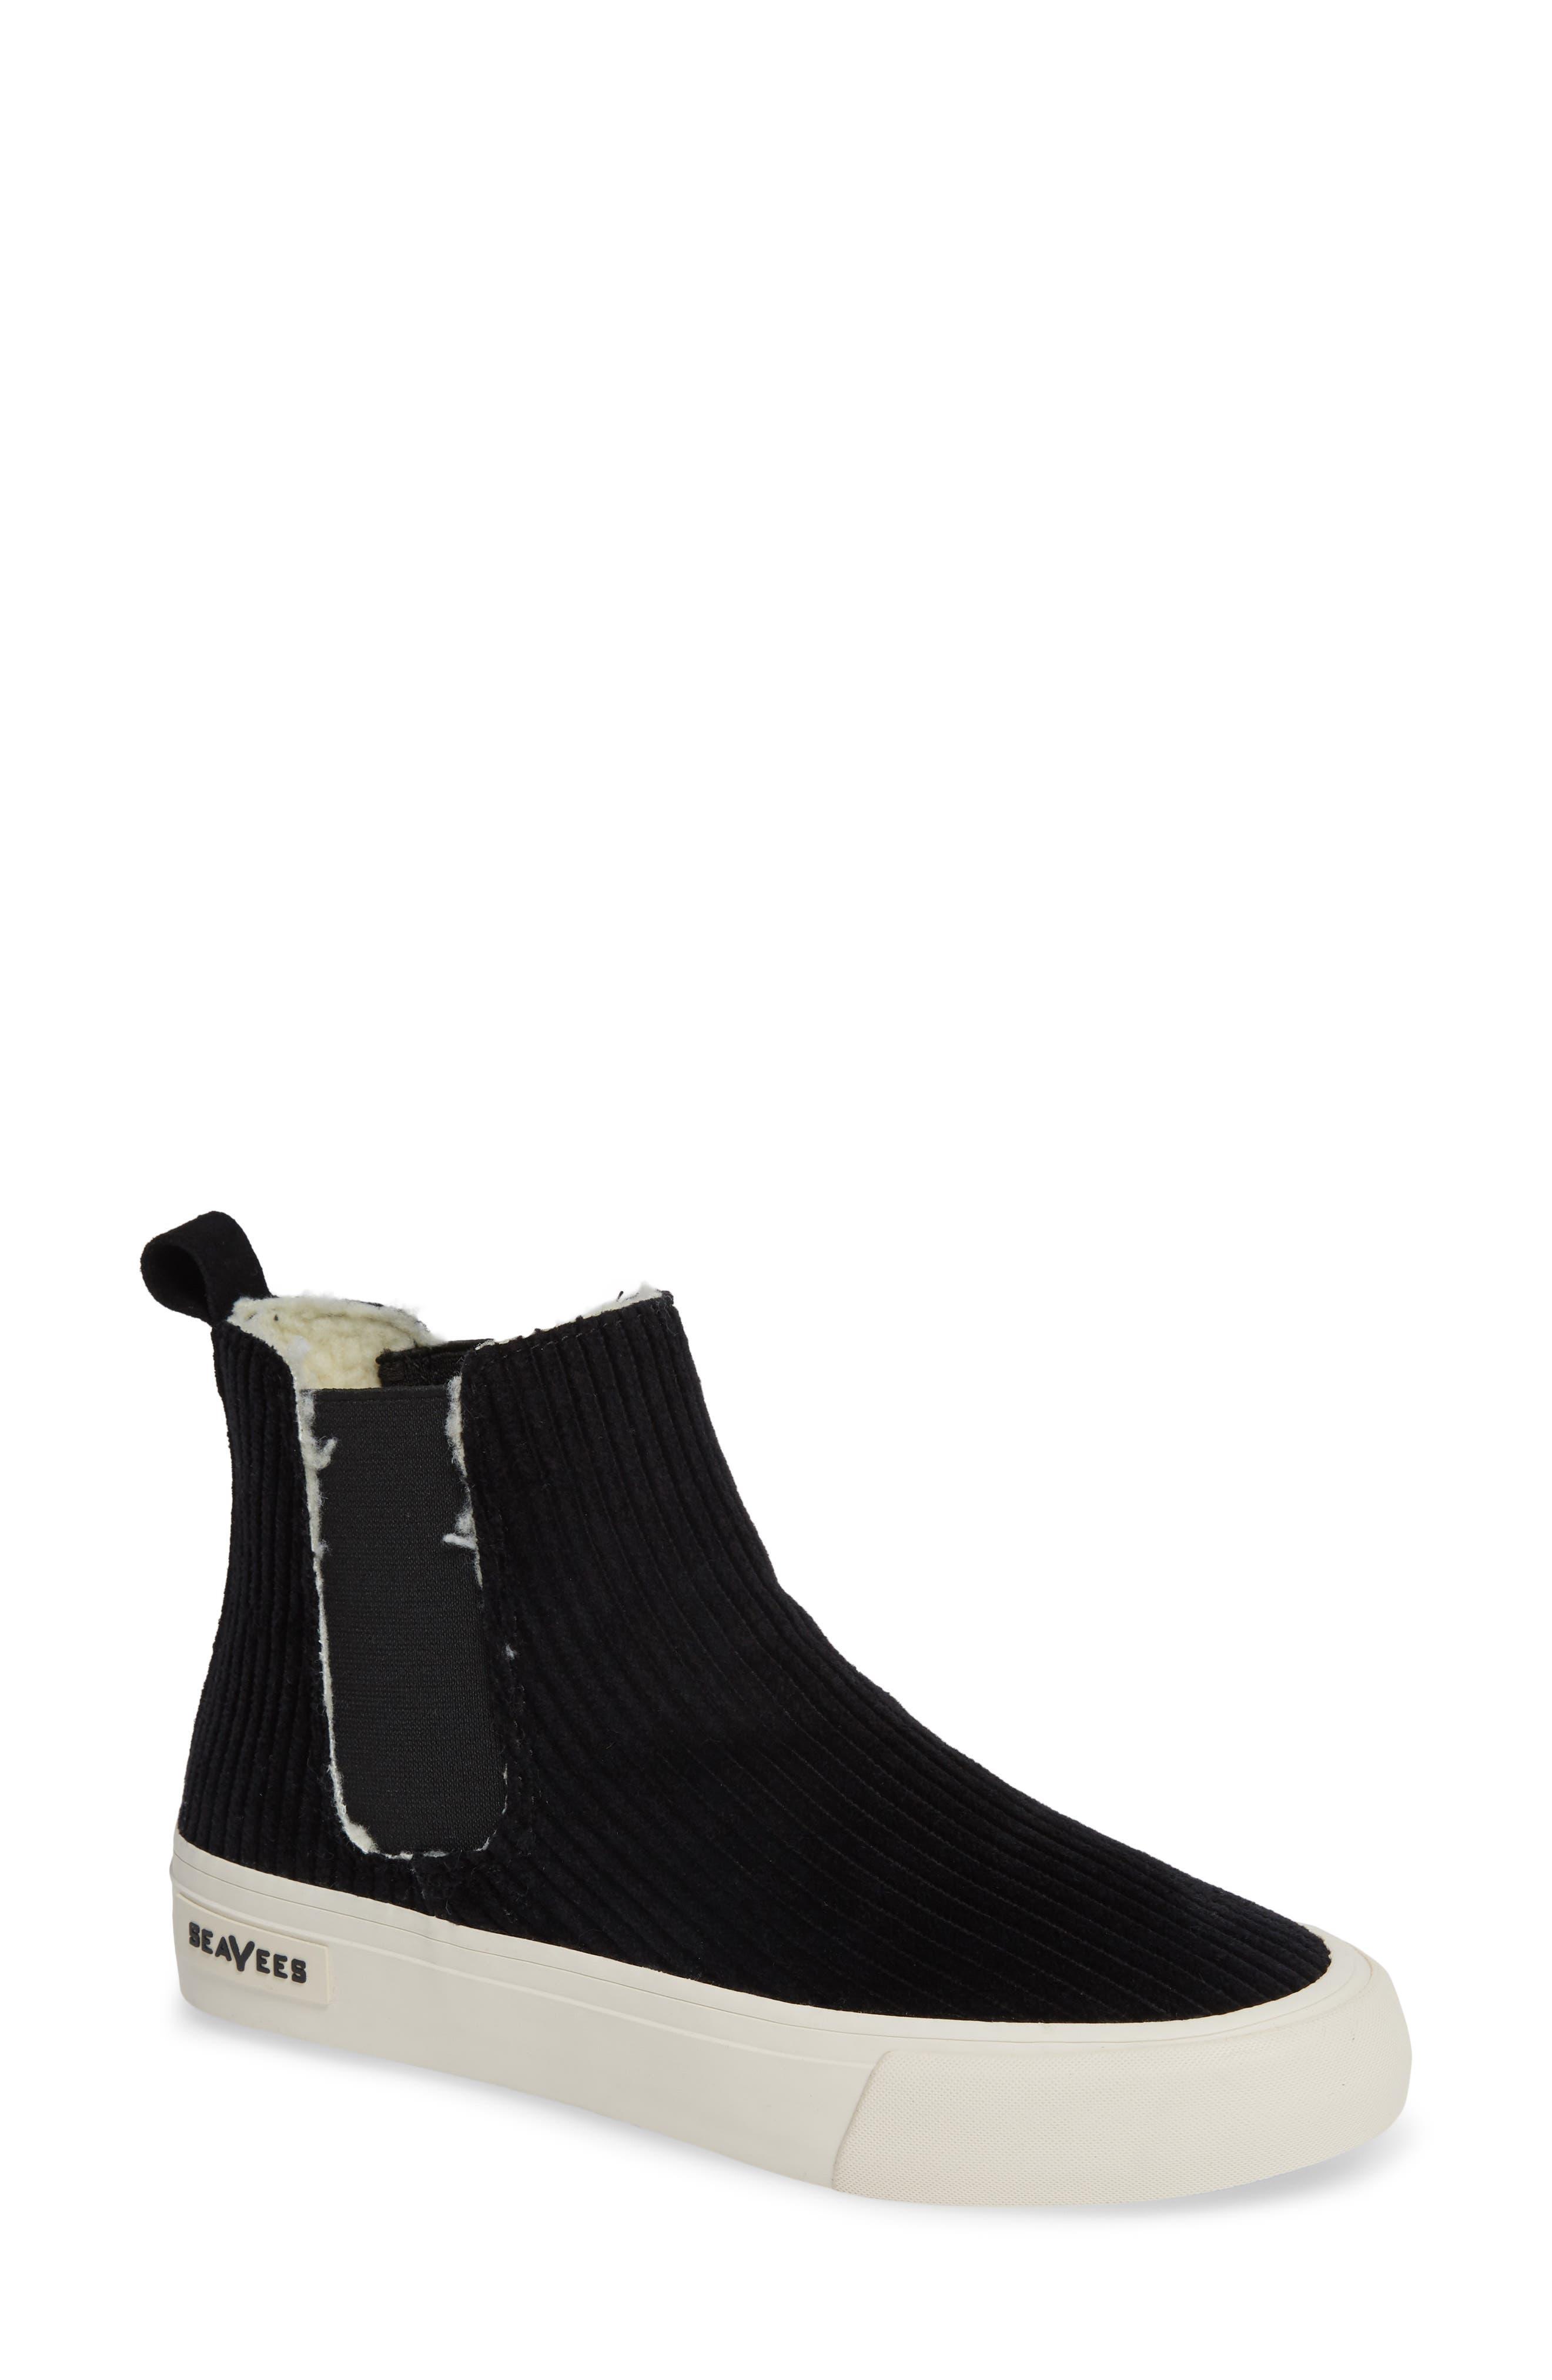 SEAVEES Laguna Chelsea Boot in Black